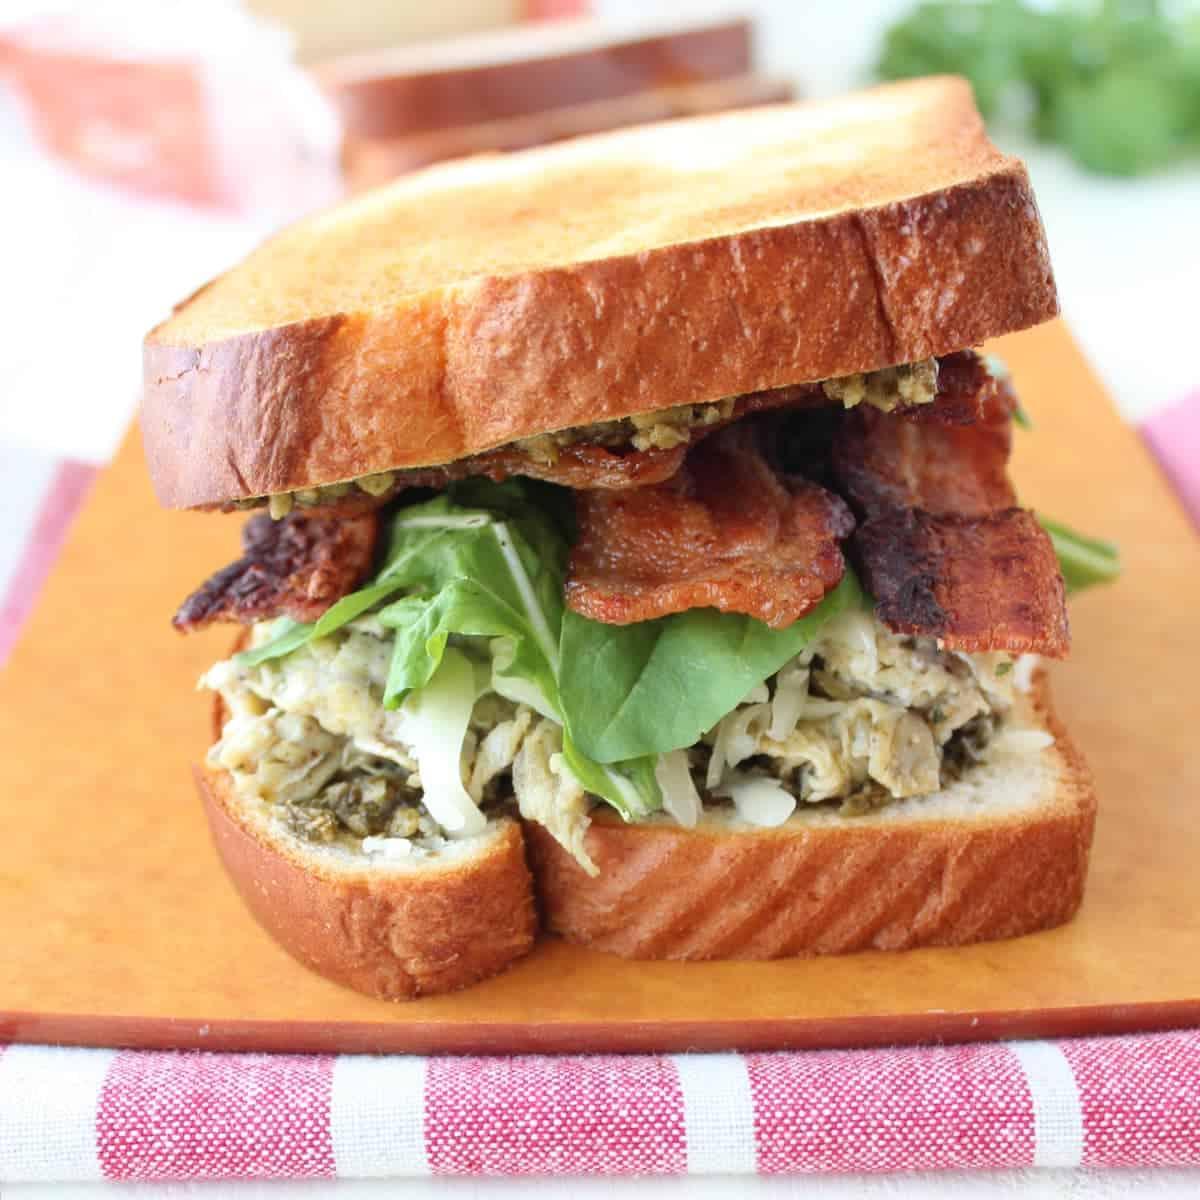 Pesto Egg and Bacon Breakfast Sandwich